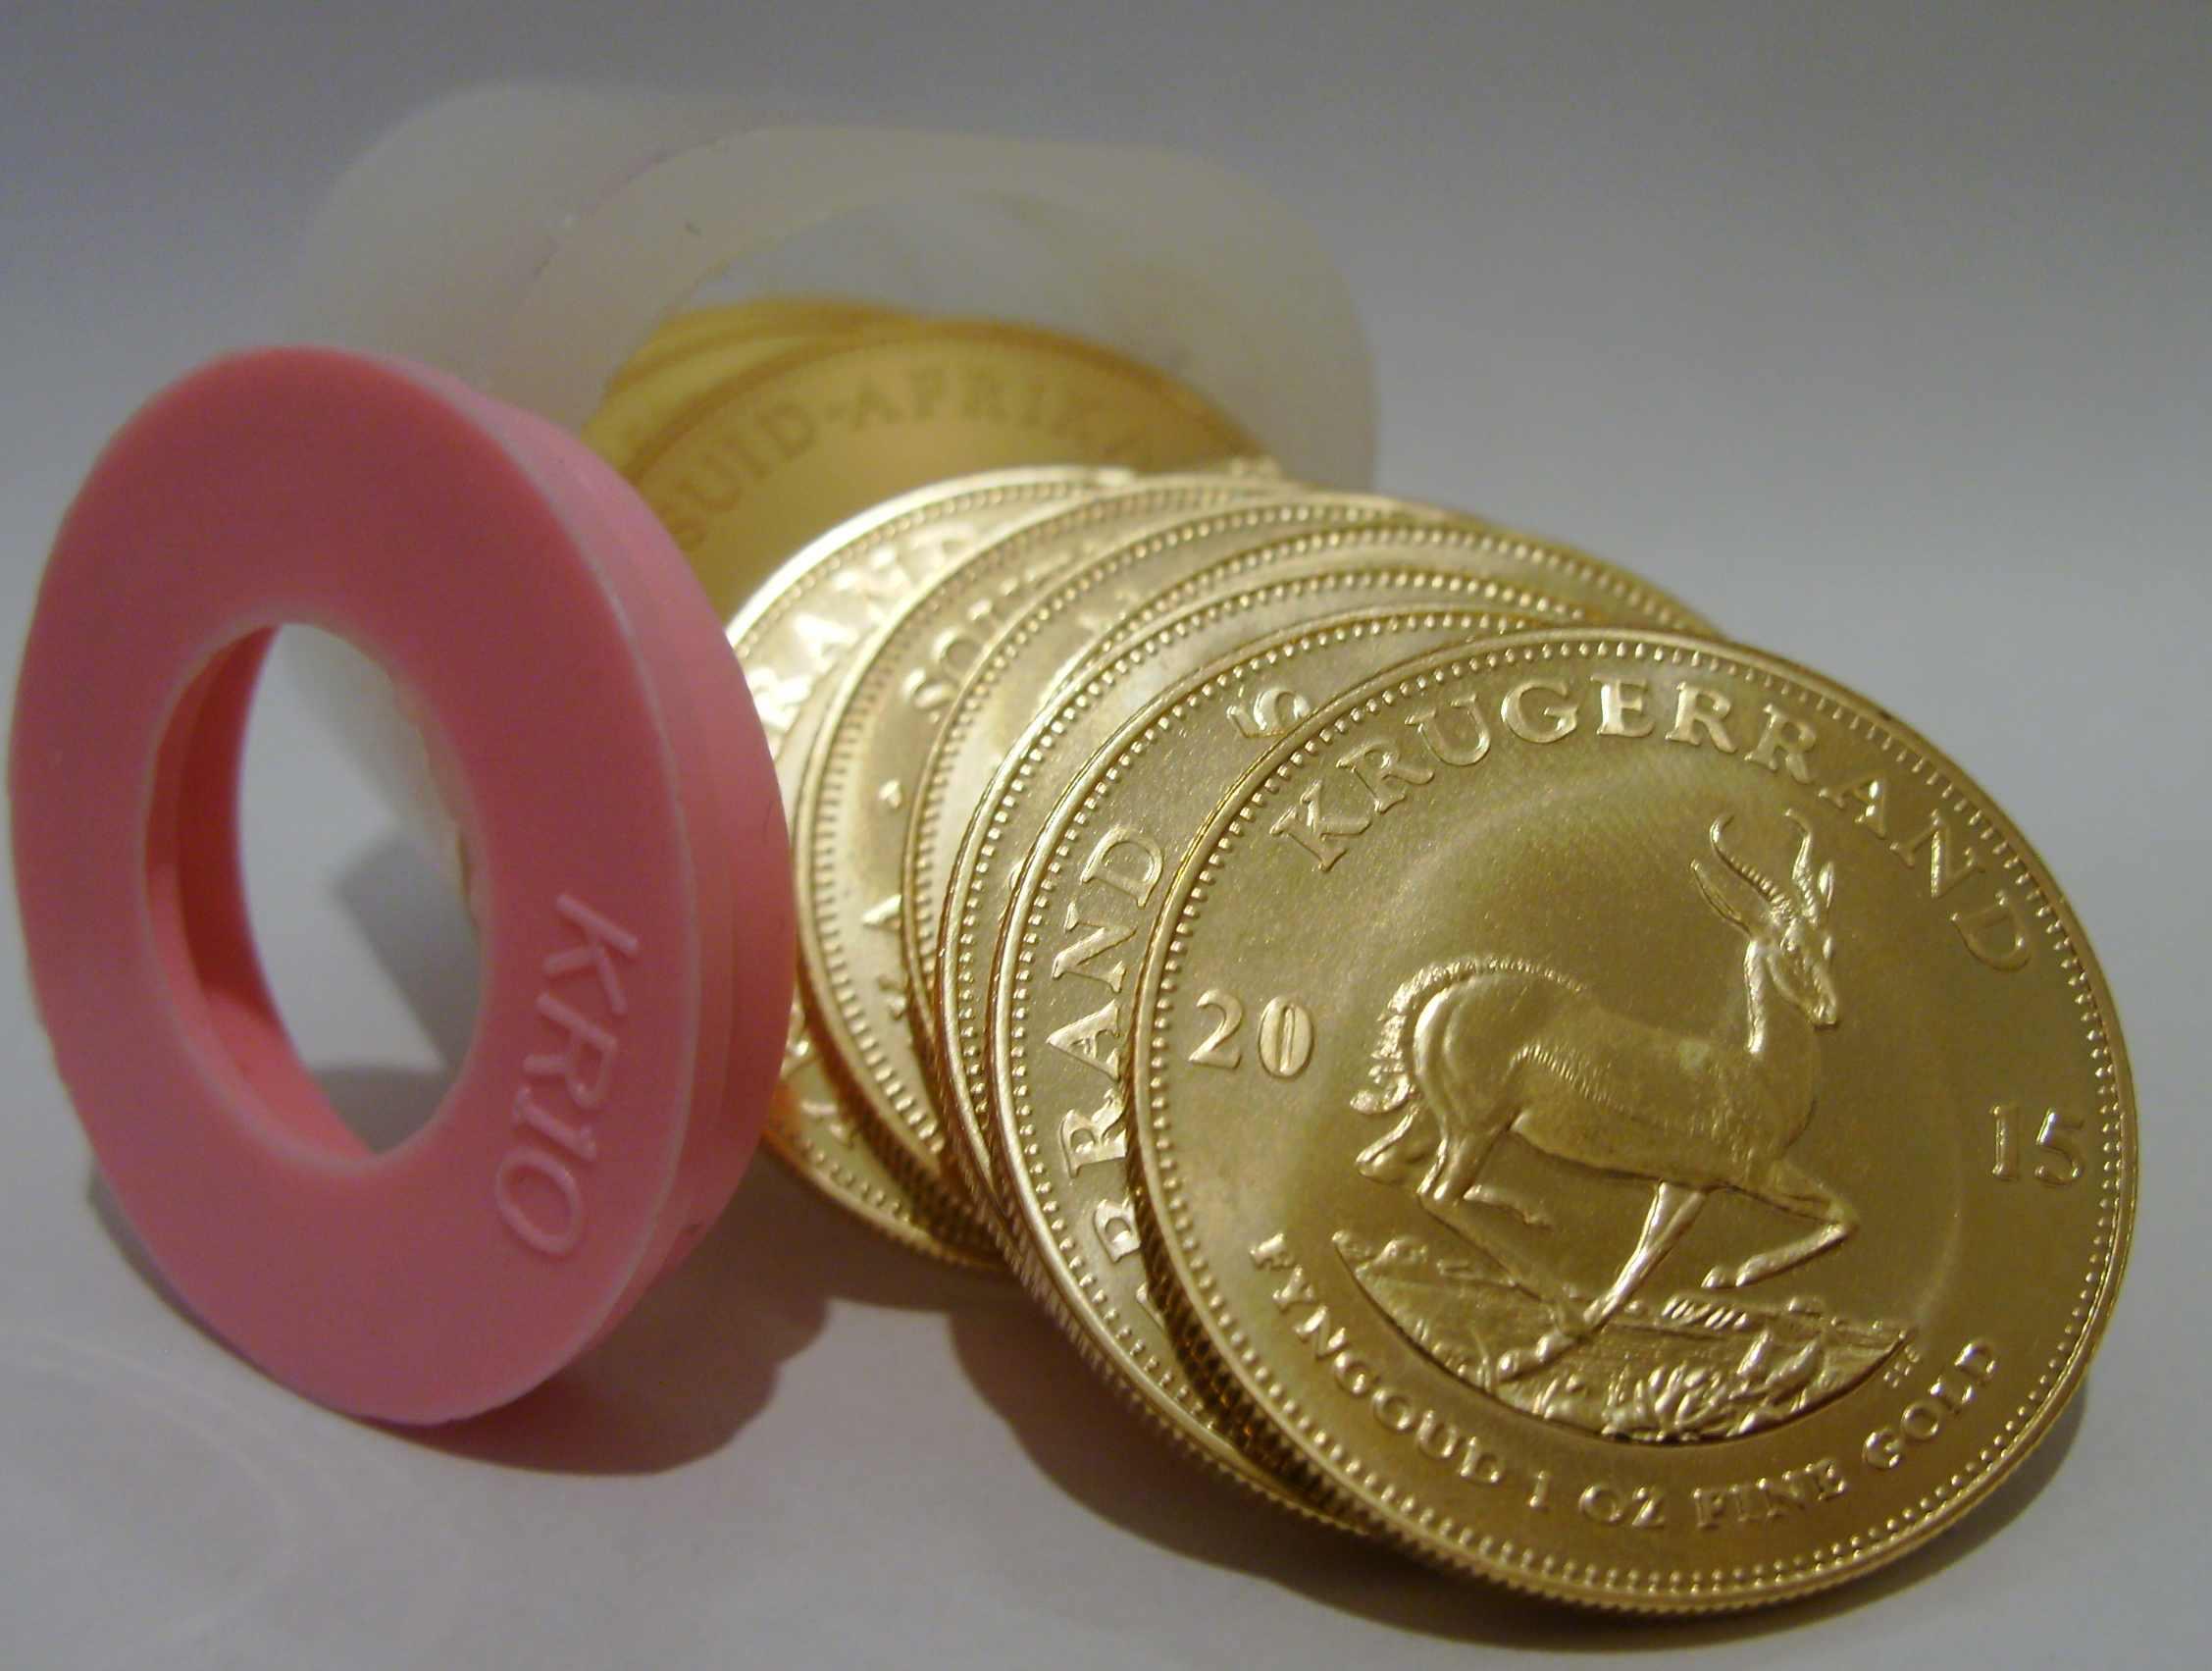 Investmentpaket Krügerrand Goldmünzen 2015